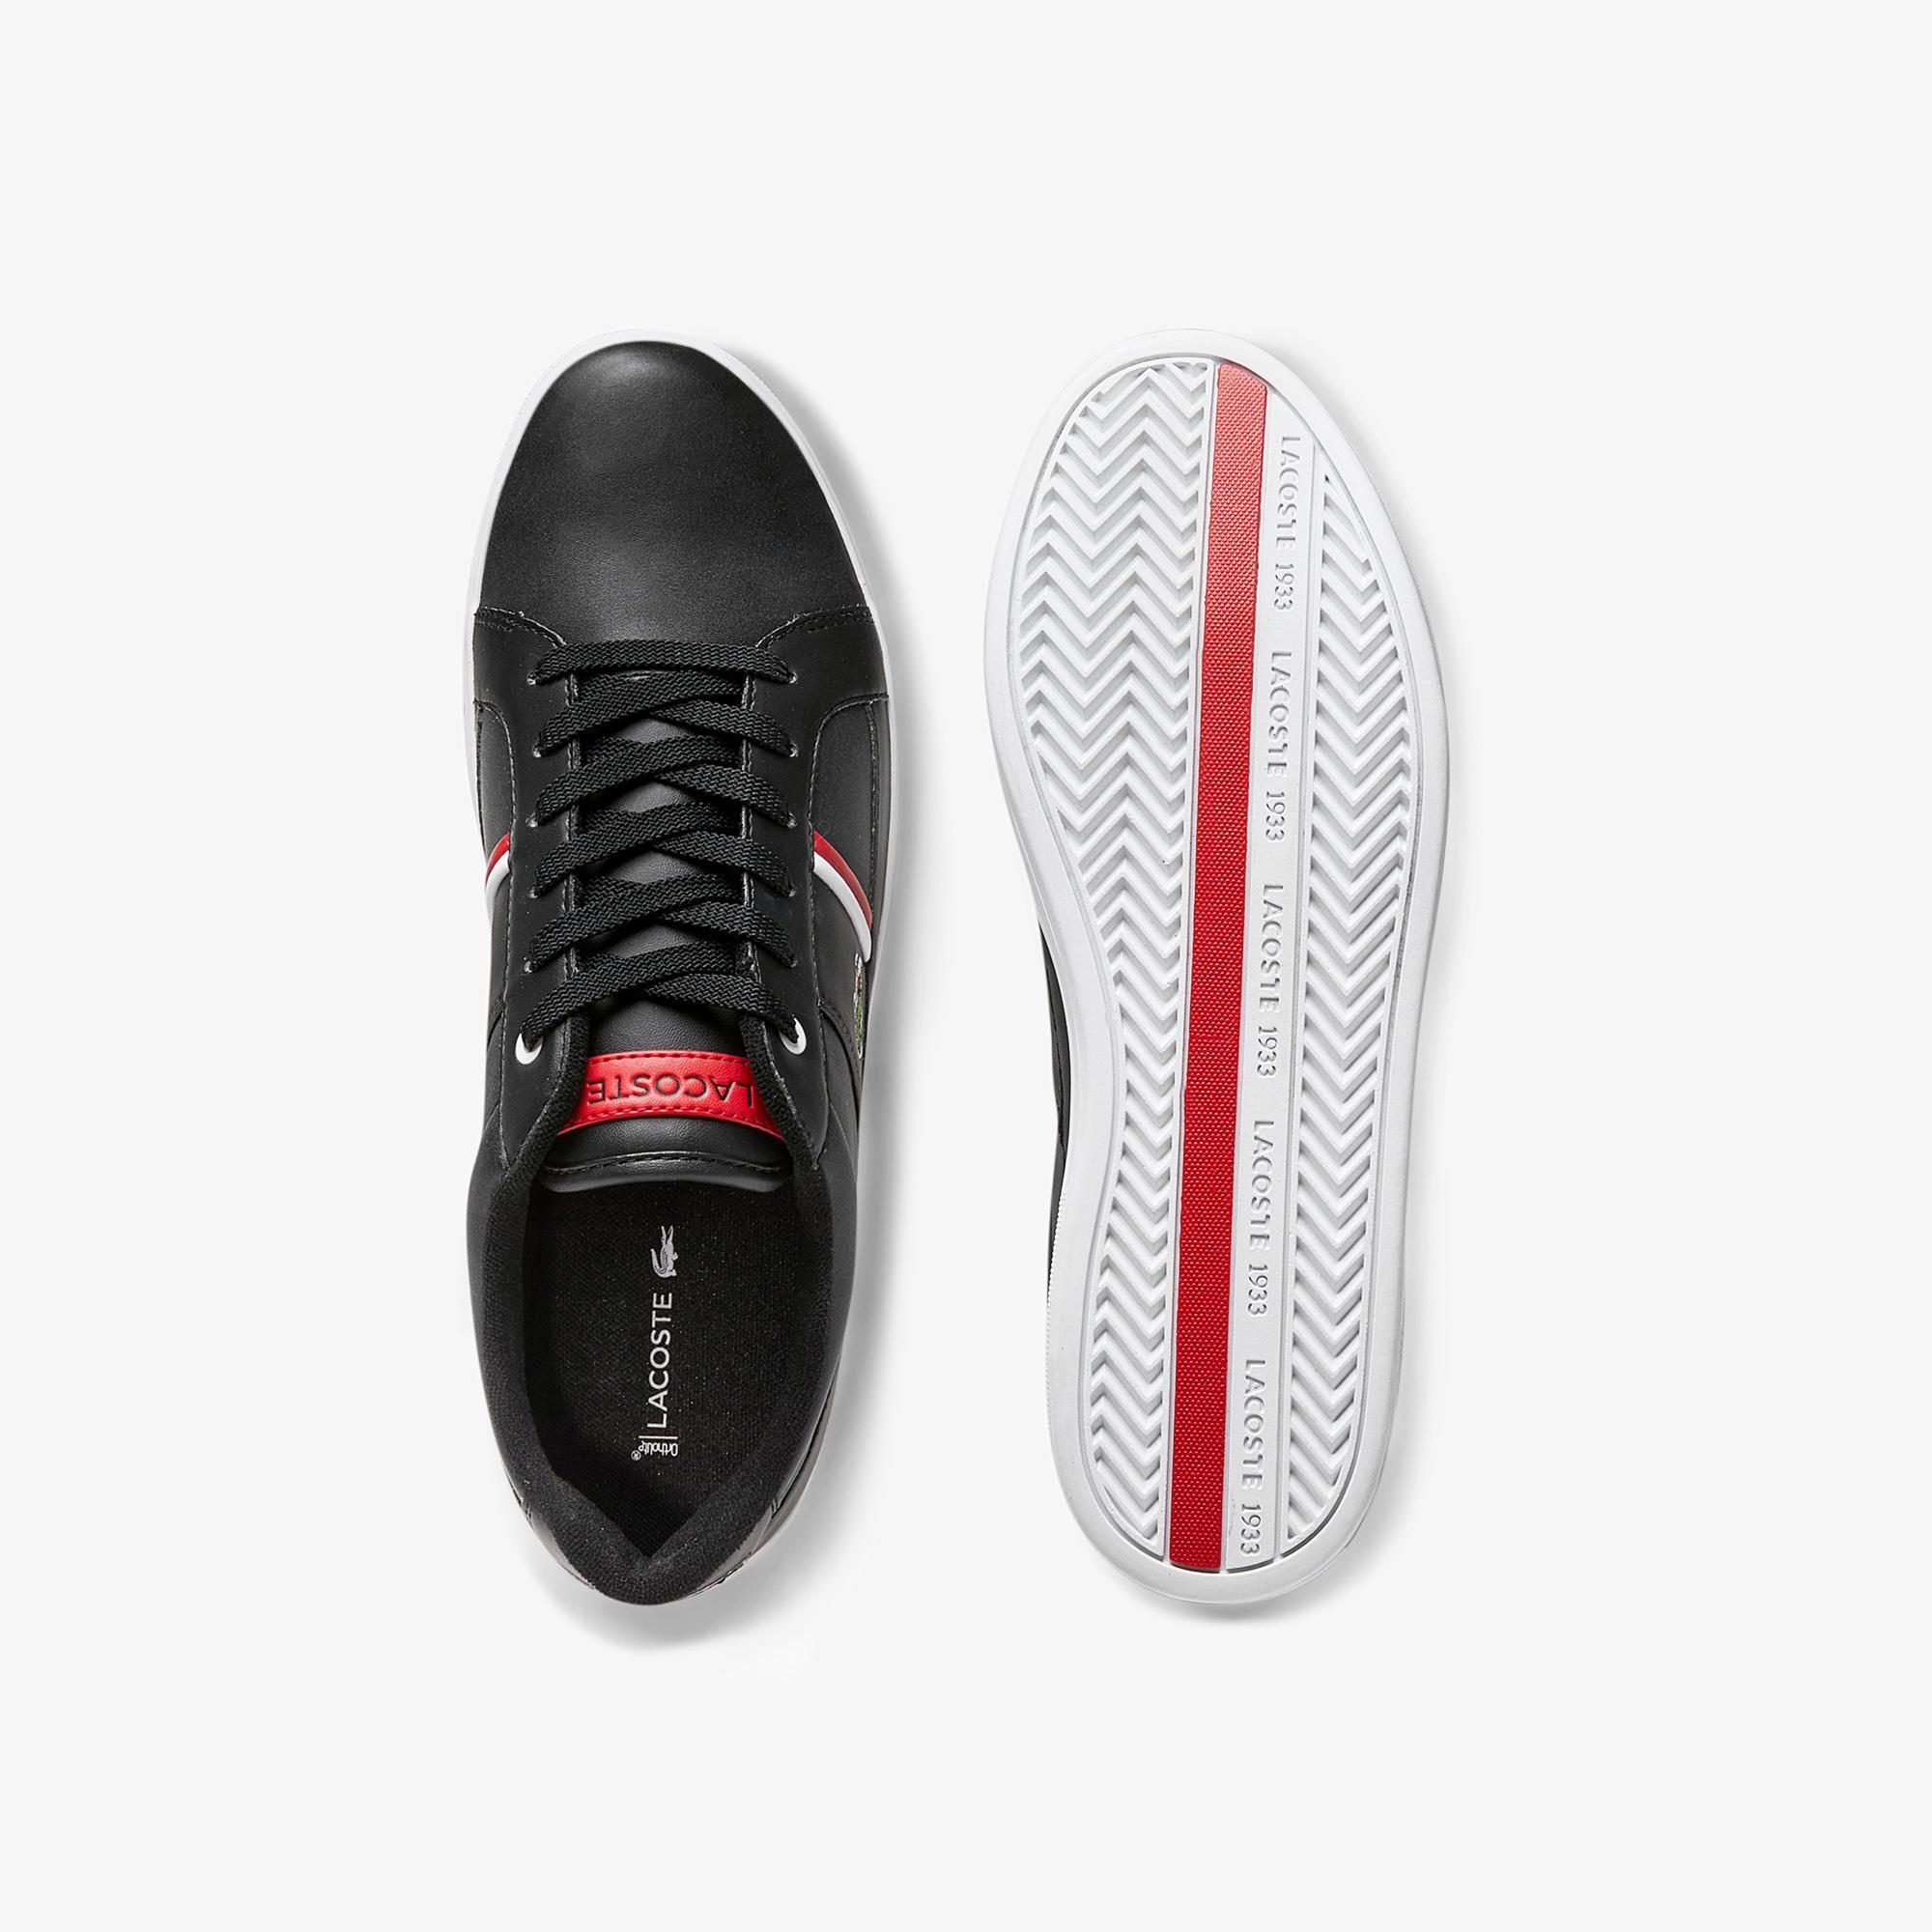 Lacoste Men's Europa Leather Sneakers